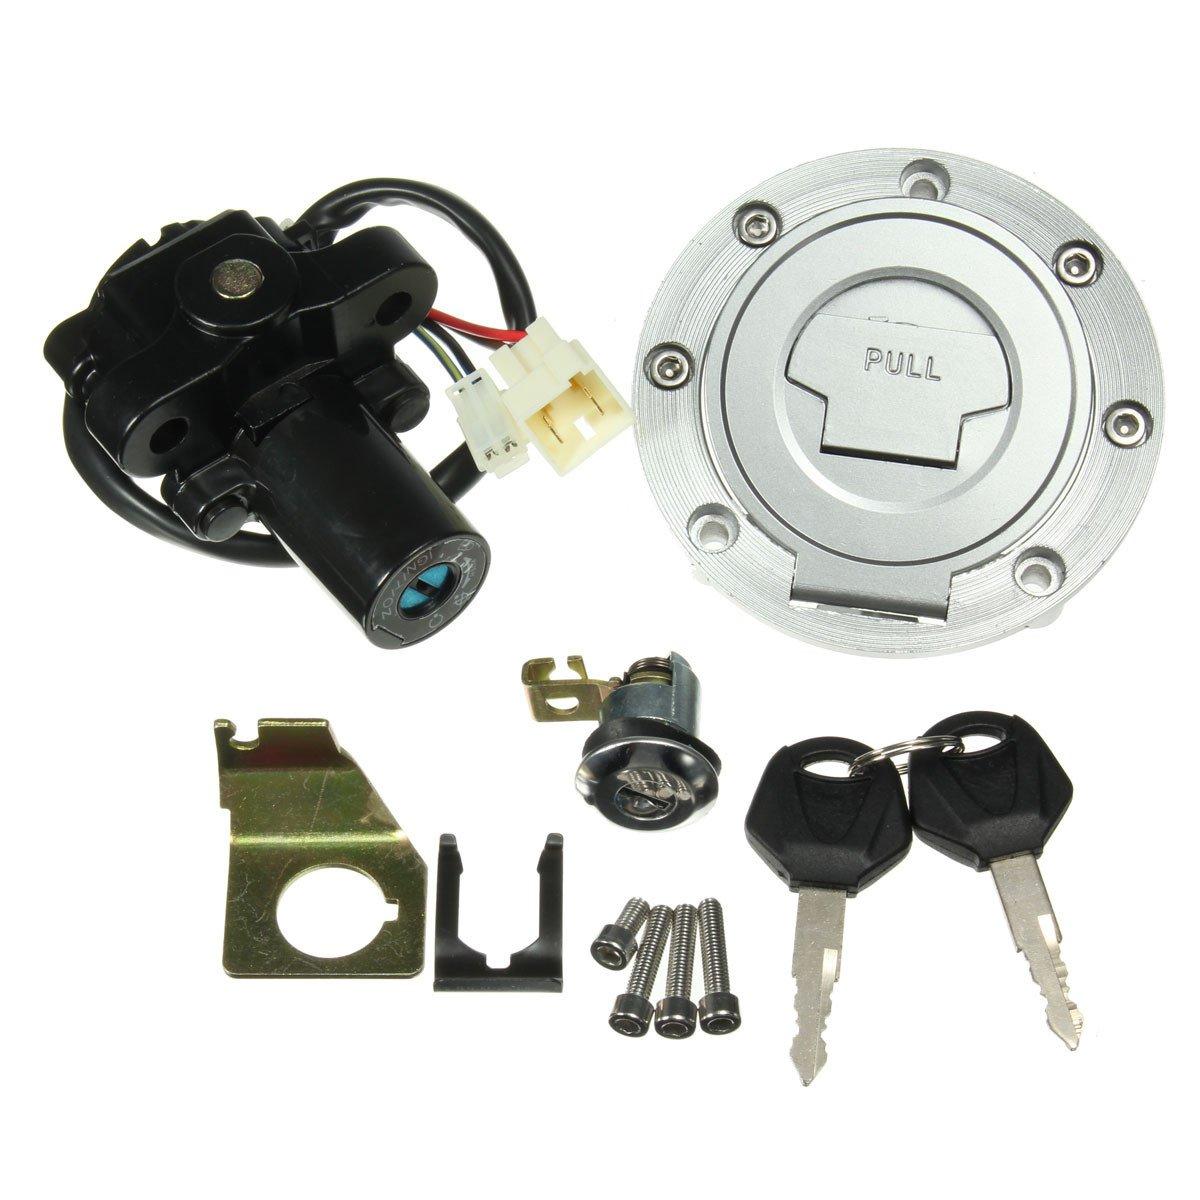 Alamor Ignition Switch Seat Lock Fuel Gas Cap Key Set For Yamaha Yzf R1 R6 2001-2012